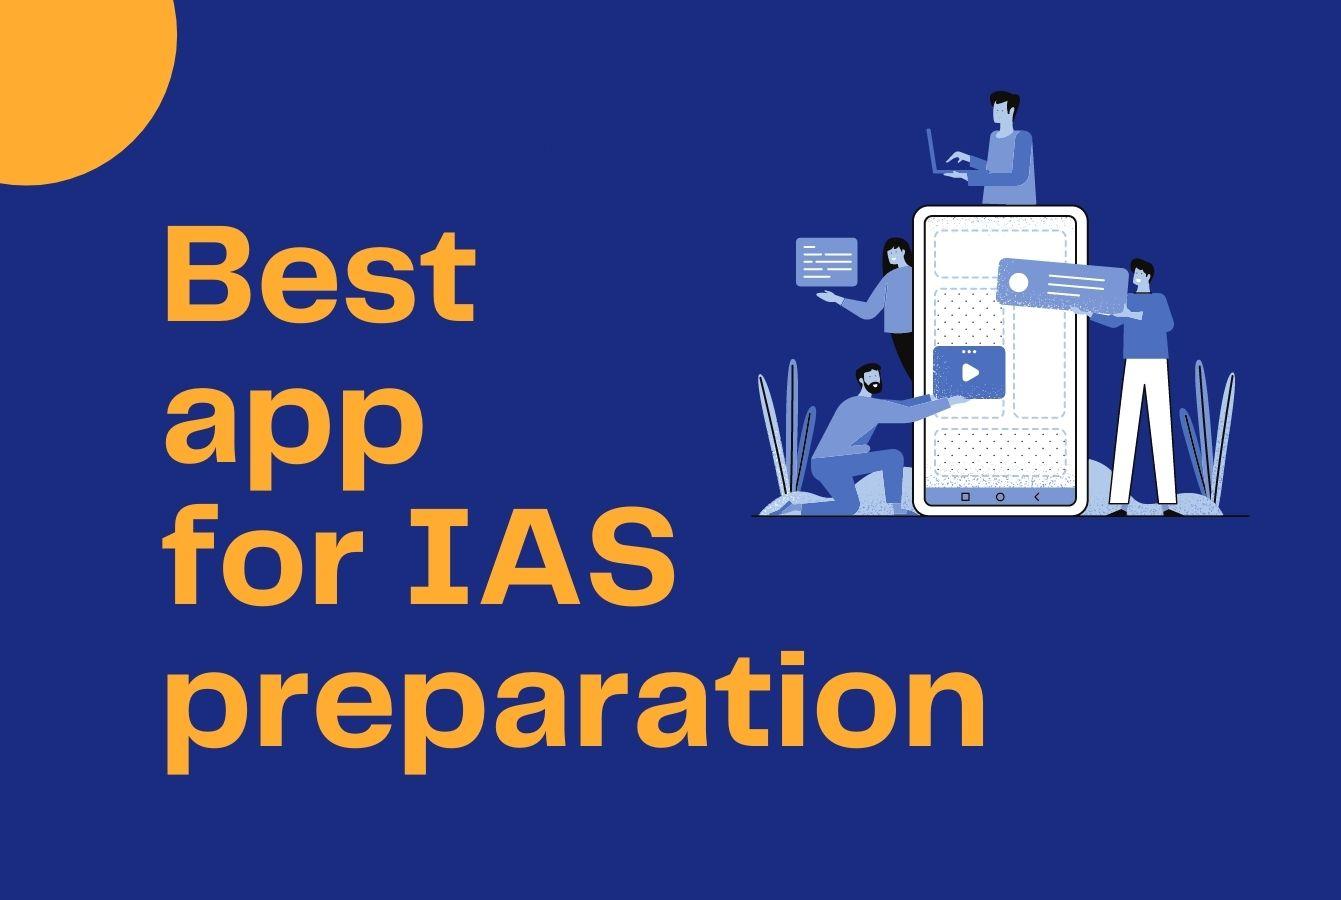 Best app for IAS preparation